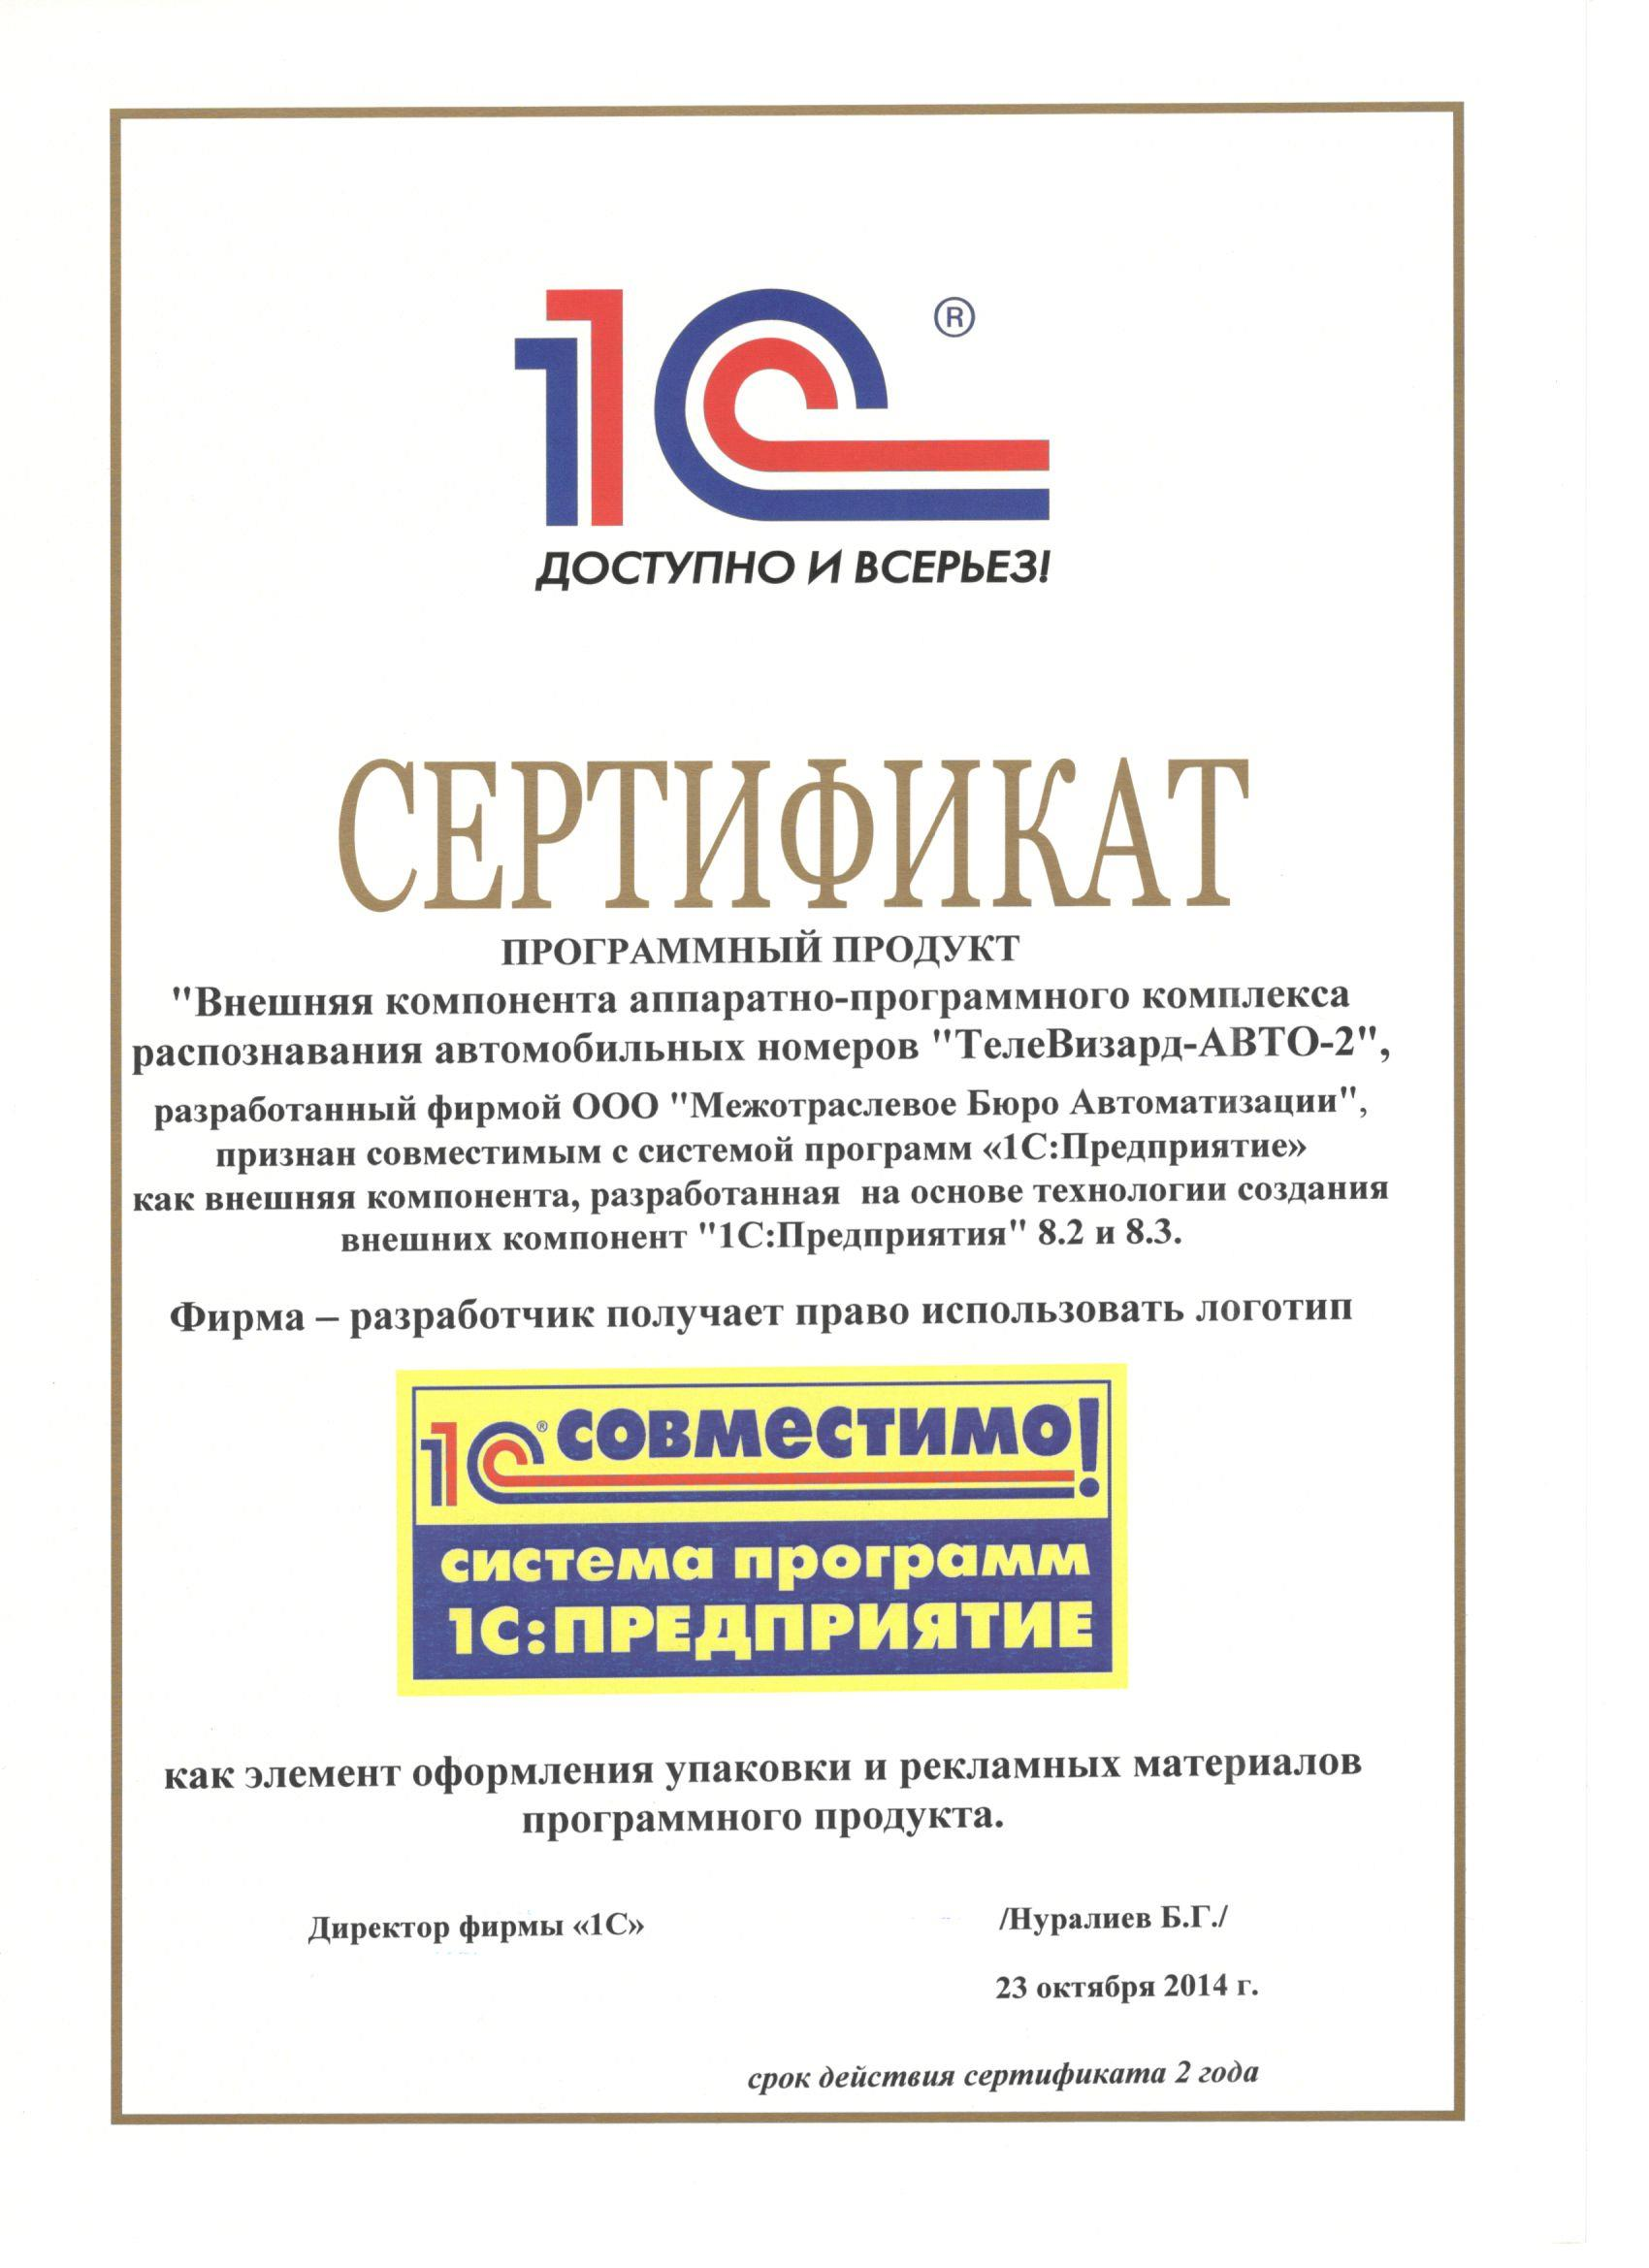 2014.11.10 Сертификат 1С Совместимо. ТелеВизард-АВТО-2